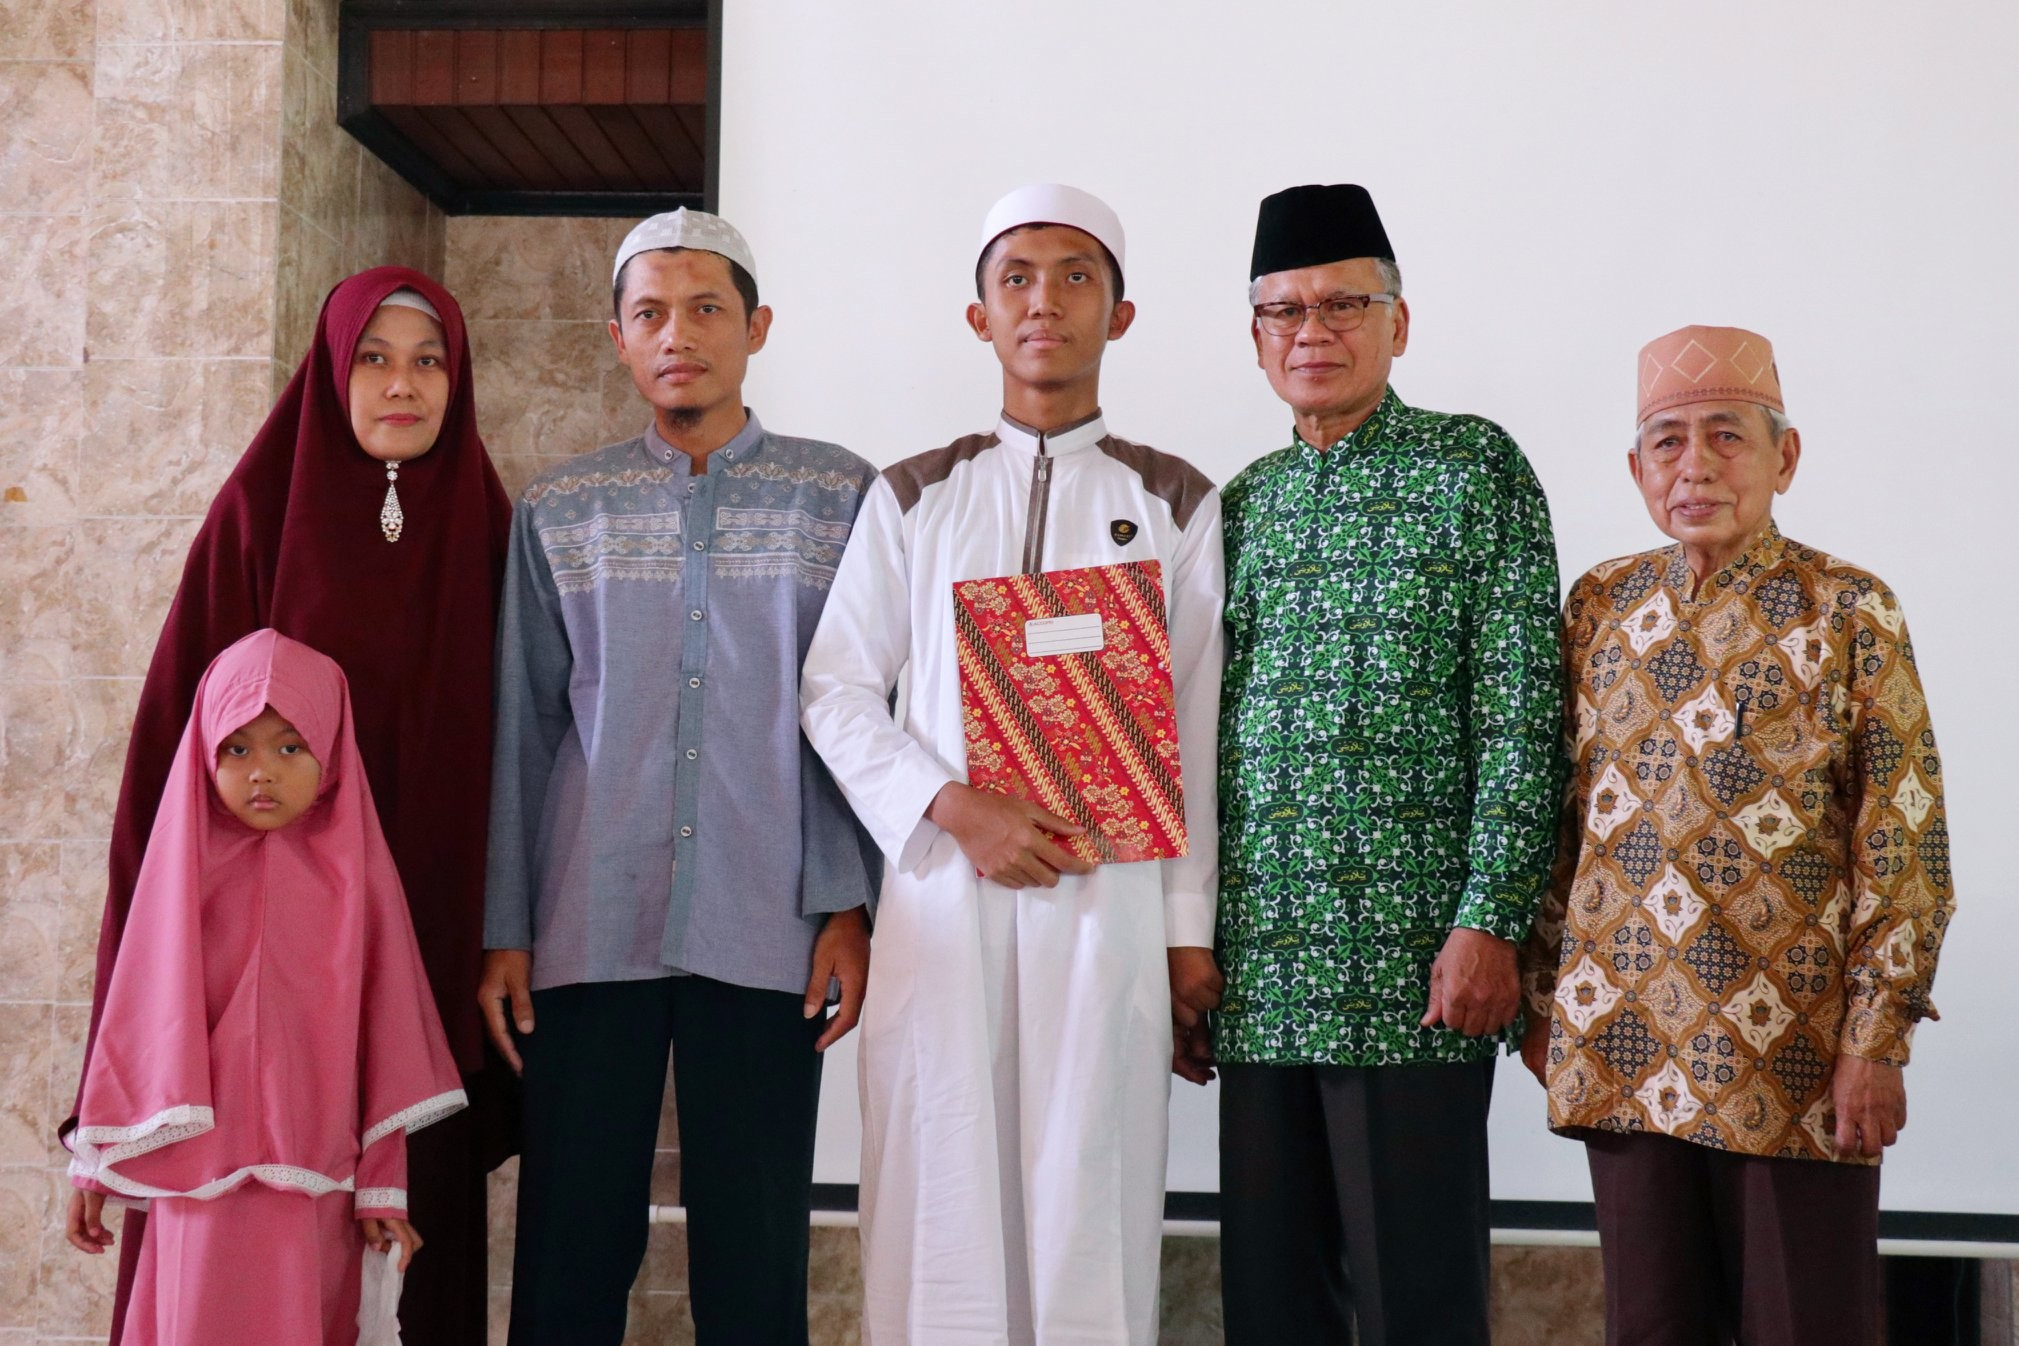 Catat Sejarah Pertama, Rumah Tahfiz Nurul Ilmi Sukses Menelurkan Penghapal Quran 30 Juz